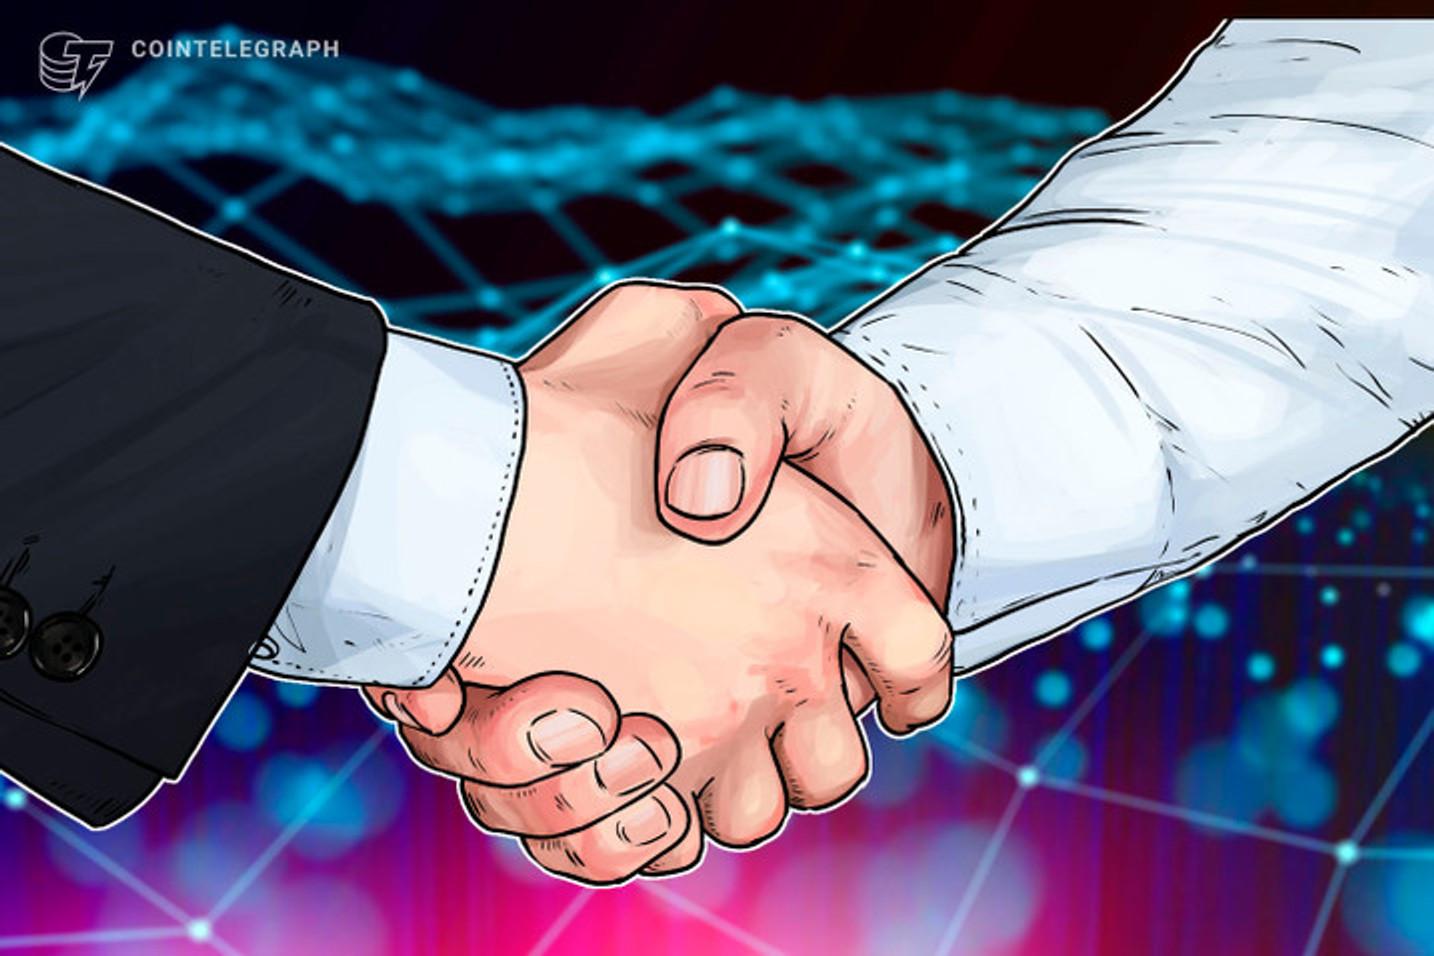 Firma española Innsomnia alcanza acuerdo de colaboración con hub sueco de innovación Fintech